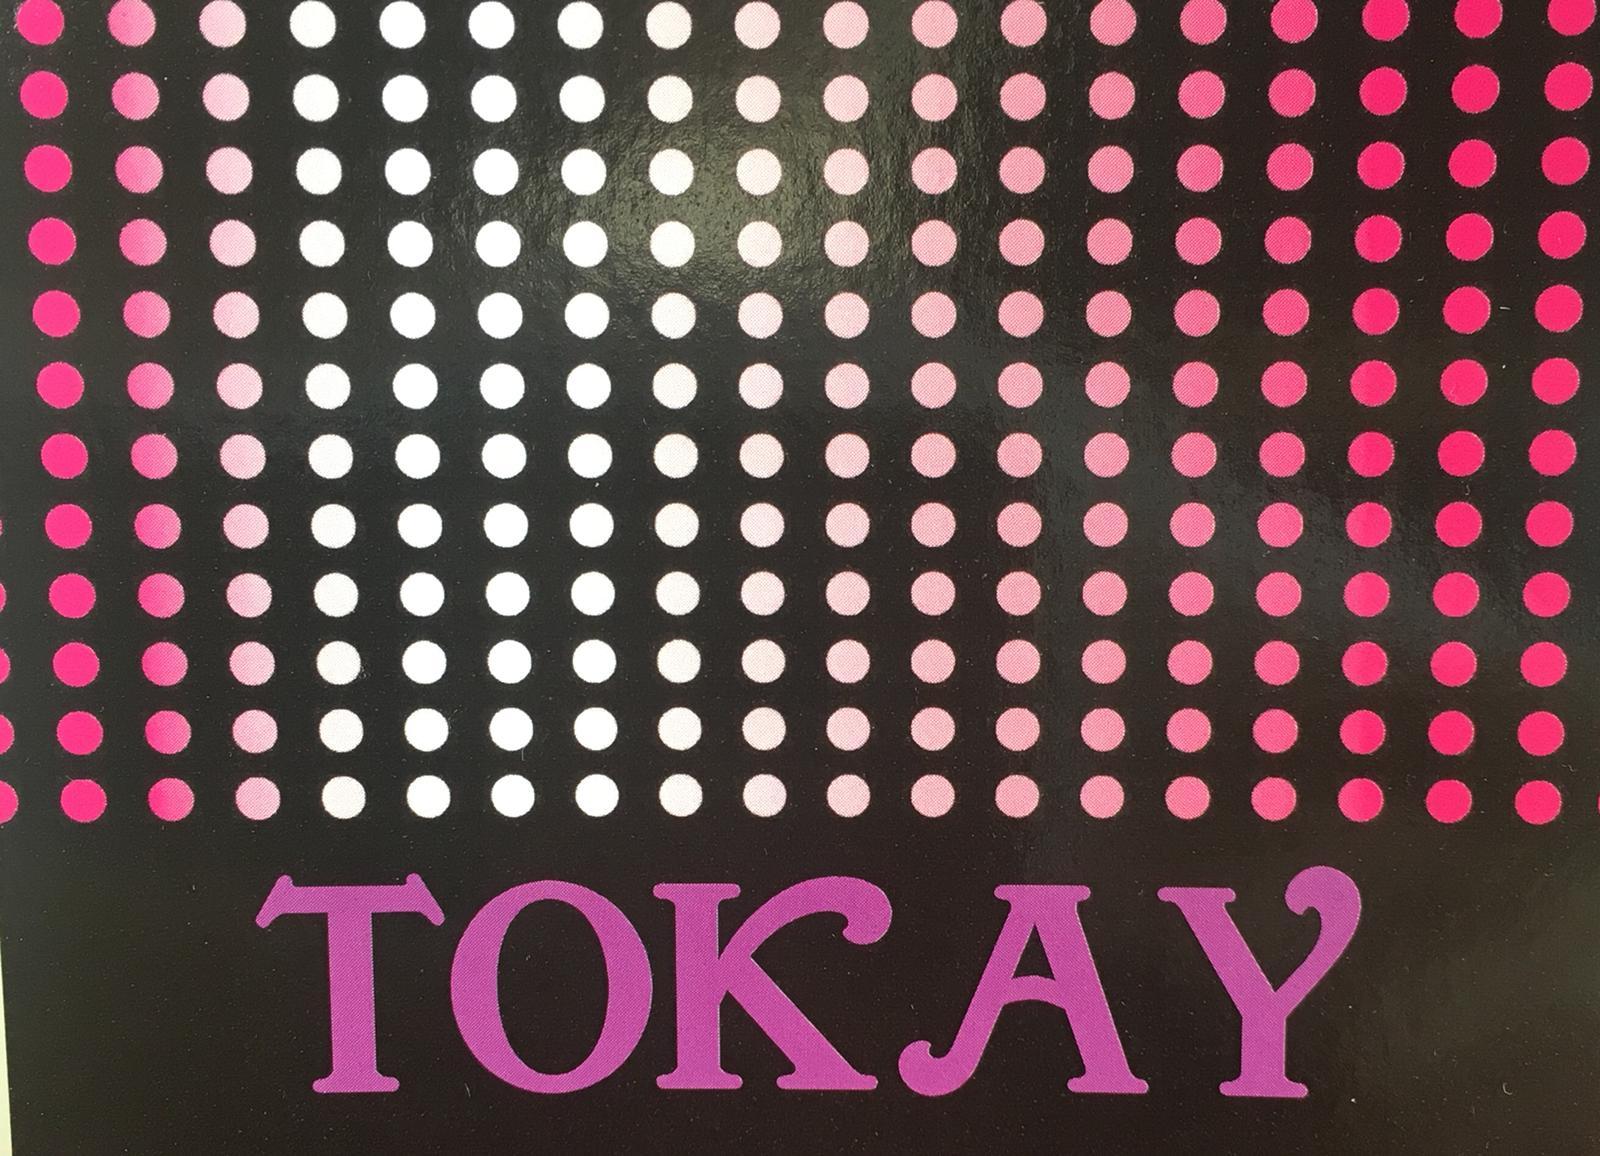 New Tokay